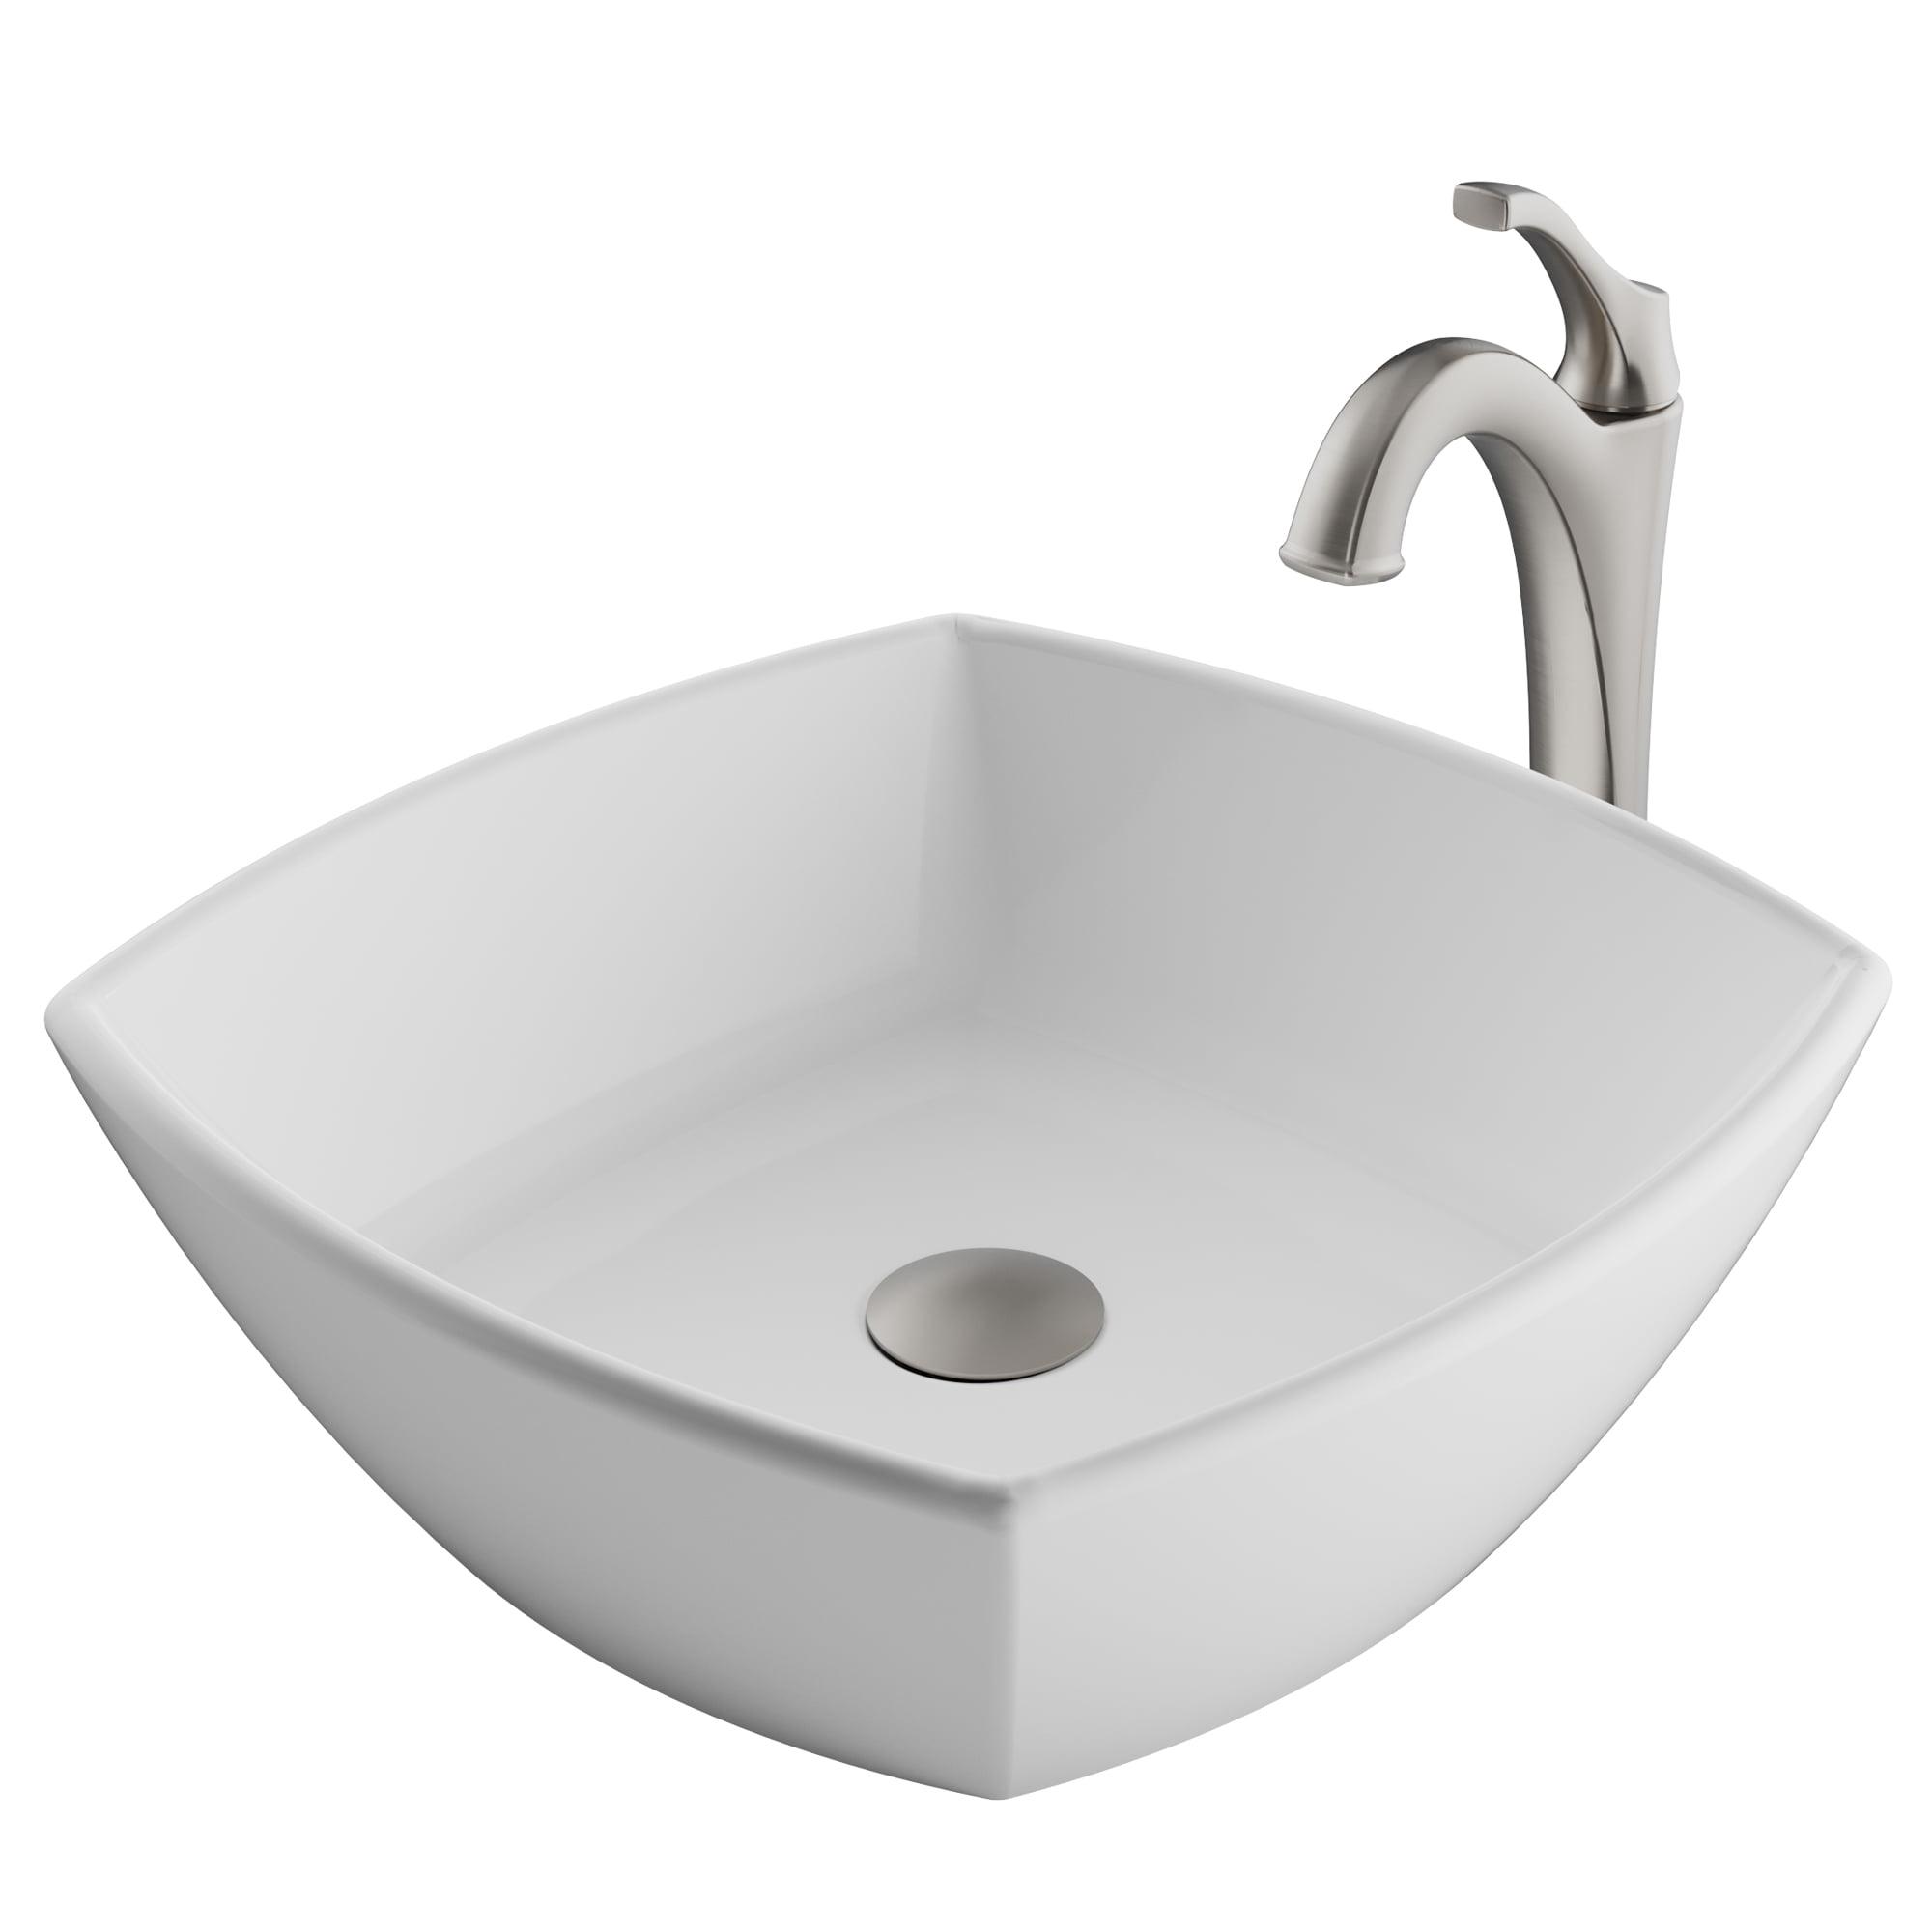 Kraus Elavo 16 1 2 Inch Square White Porcelain Ceramic Bathroom Vessel Sink And Spot Free Arlo